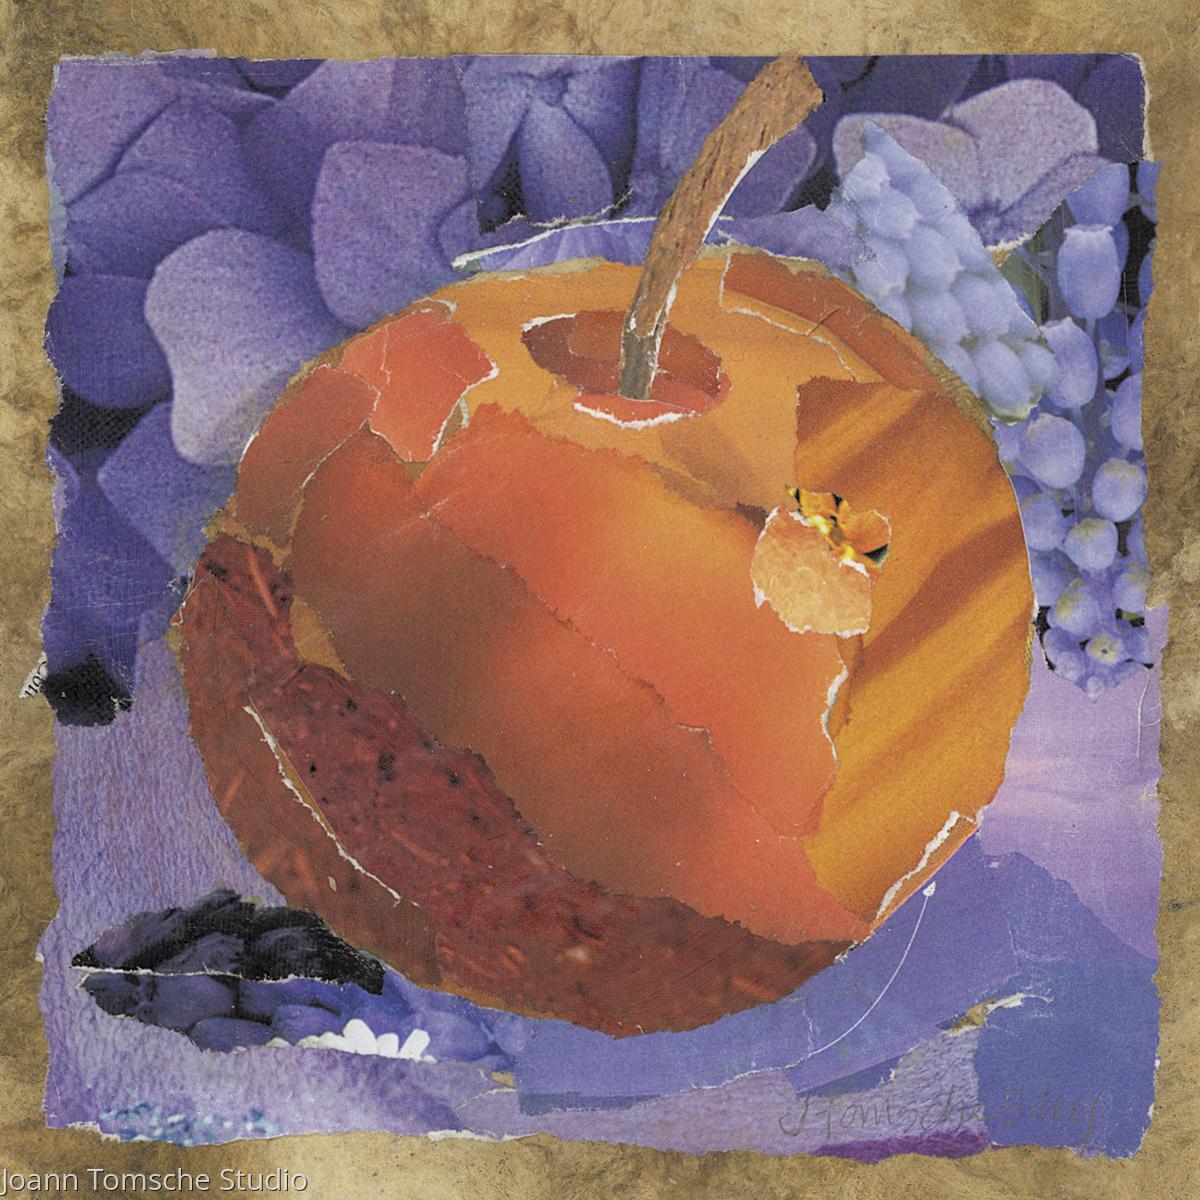 Golden Apple art tile (large view)